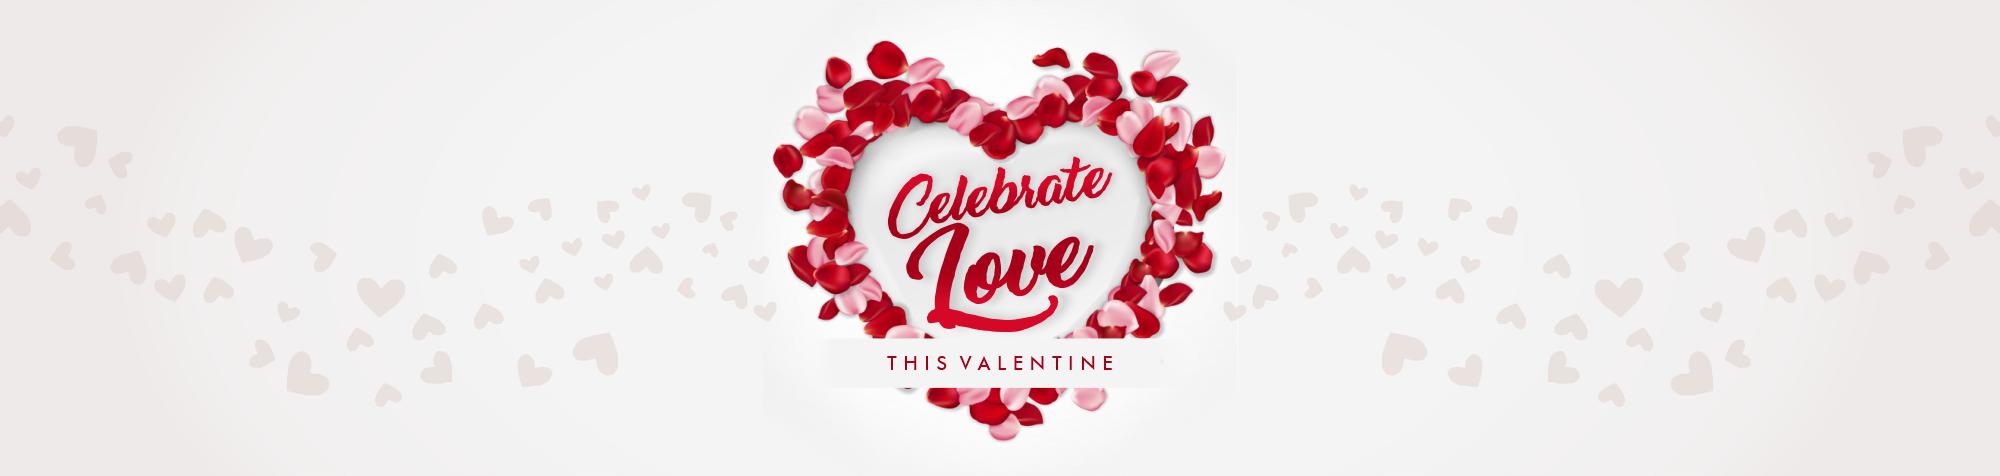 Celebrate Love This Valentine